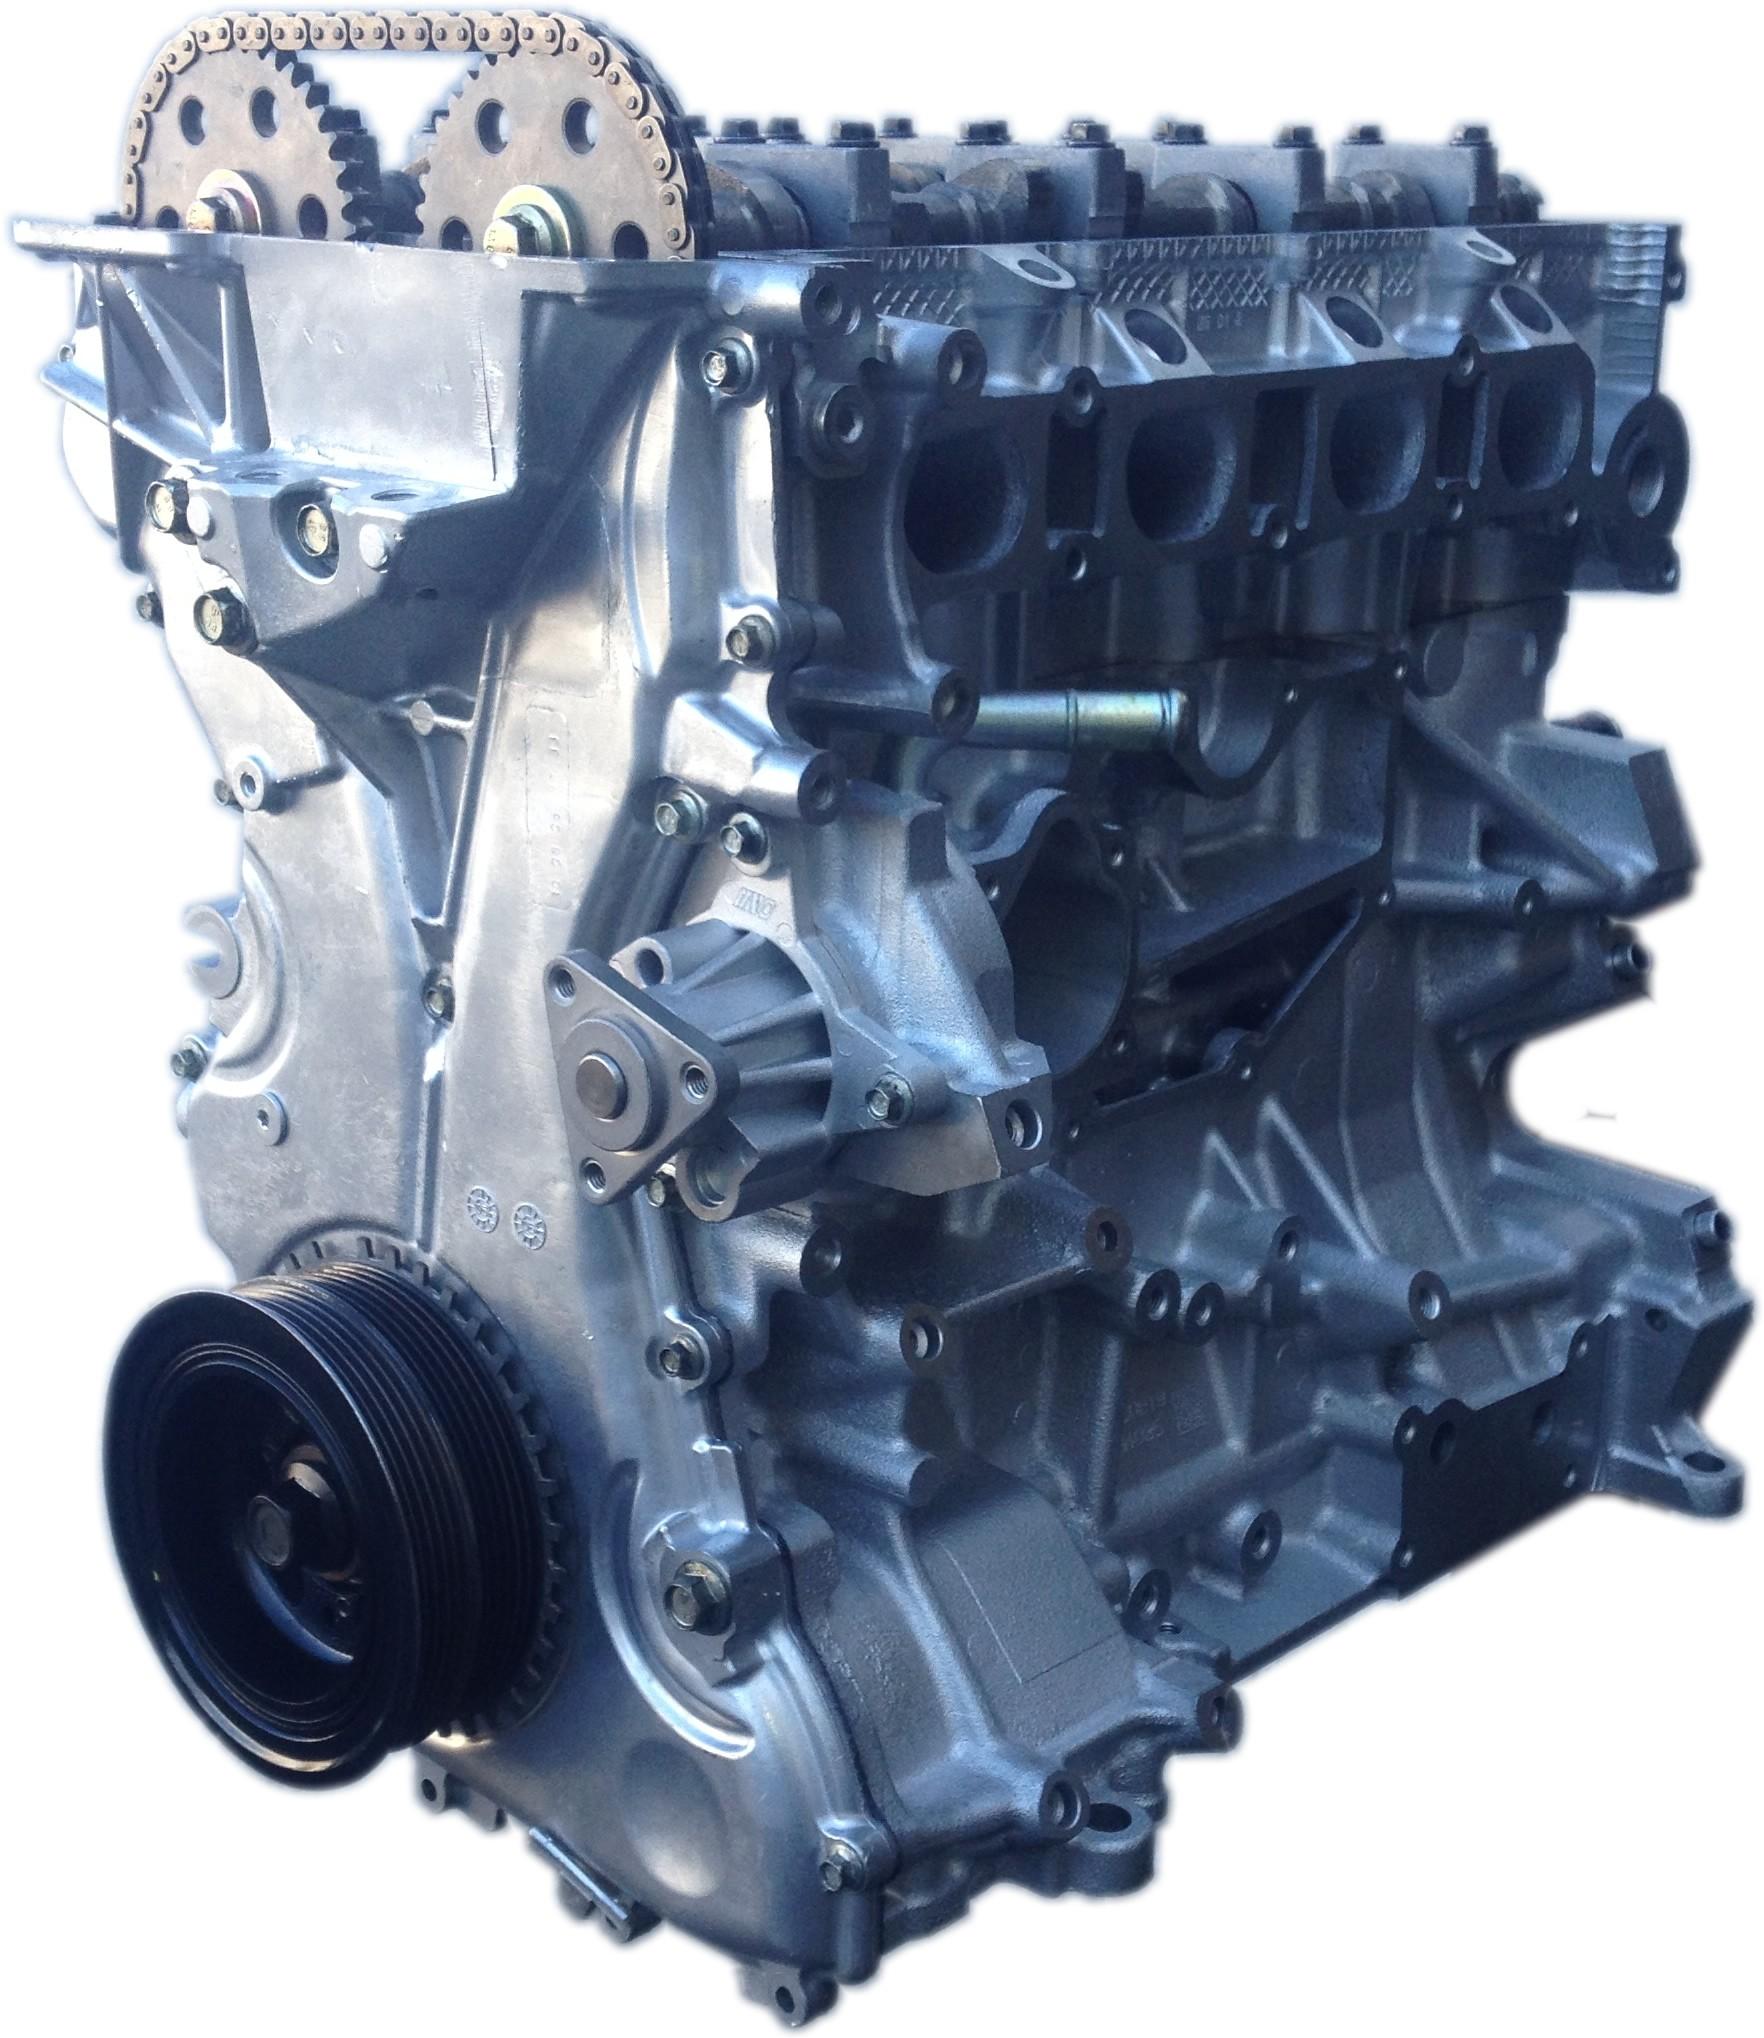 2 0l Engine: Rebuilt 04-05 Mazda3 4cyl 2.0L DOHC Engine « Kar King Auto